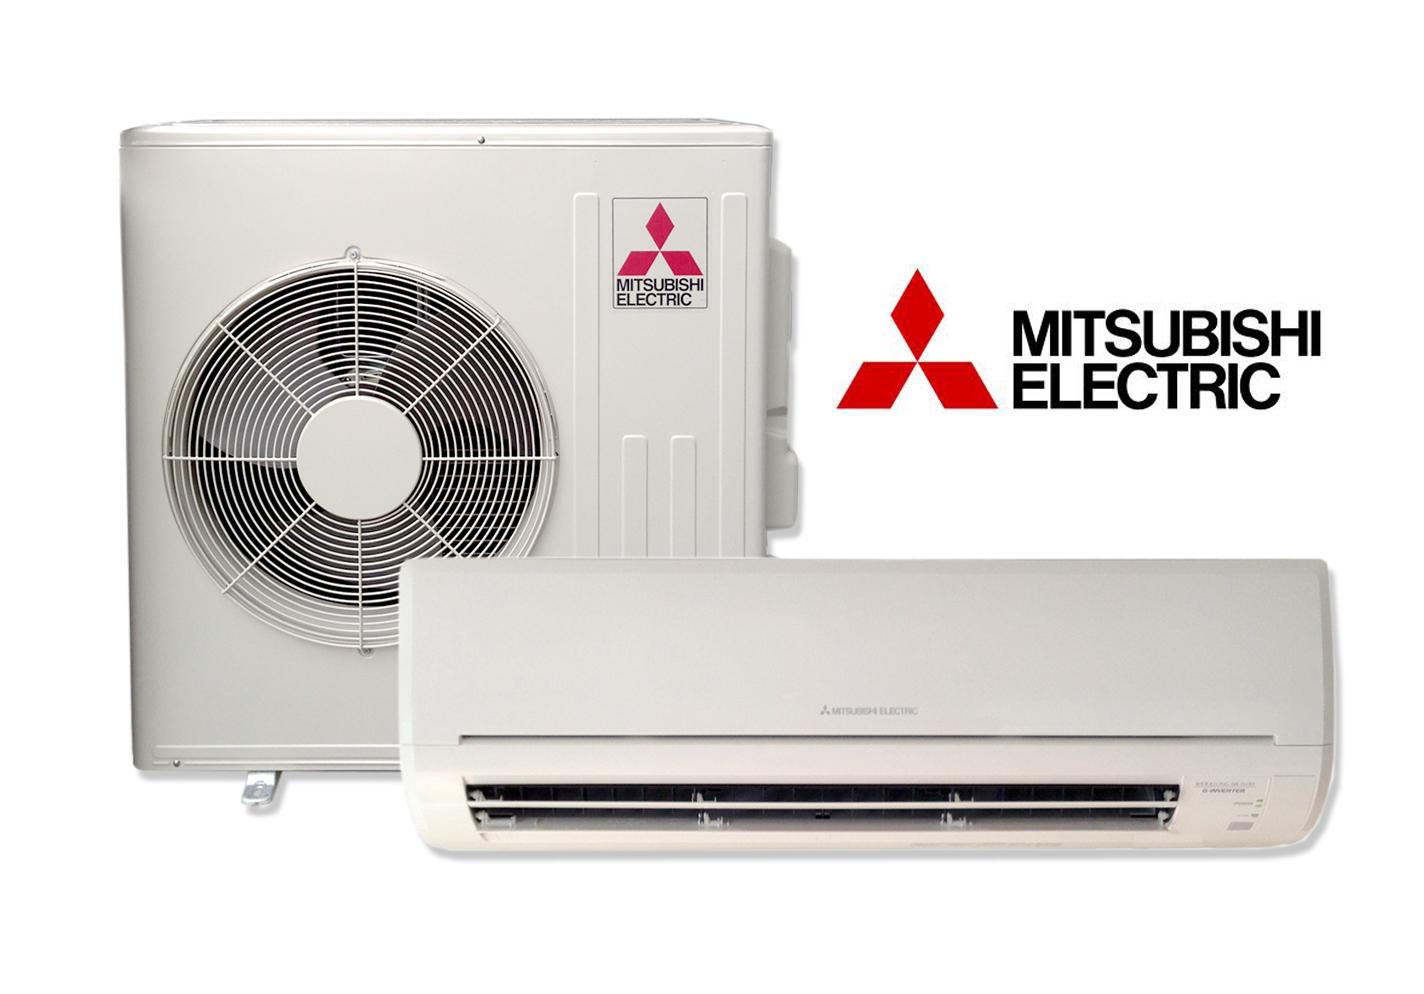 mitsubishi-electric-units